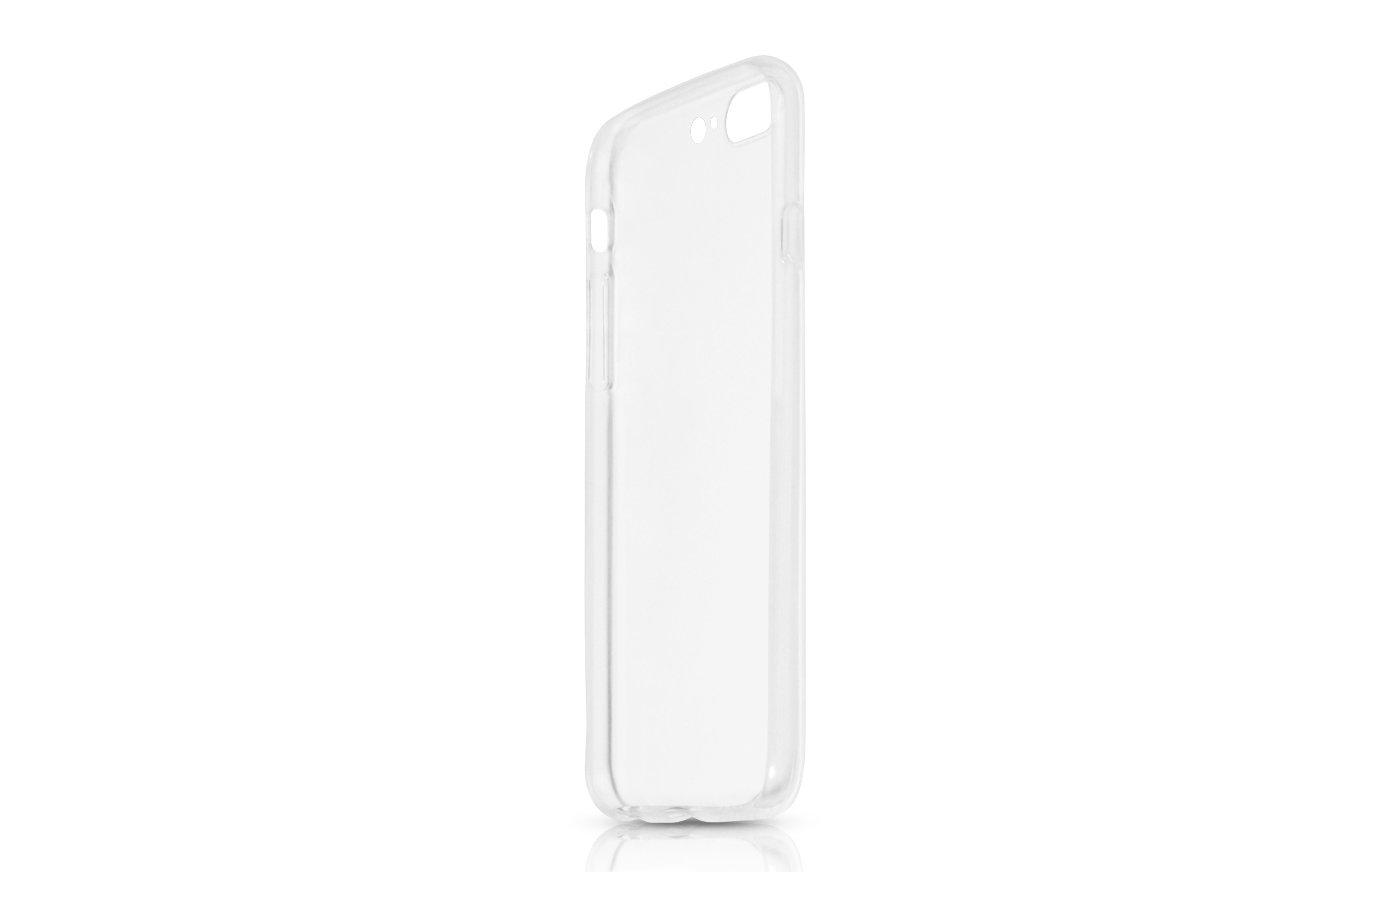 Чехол DF для iPhone 7 Plus (iCase-07) силикон